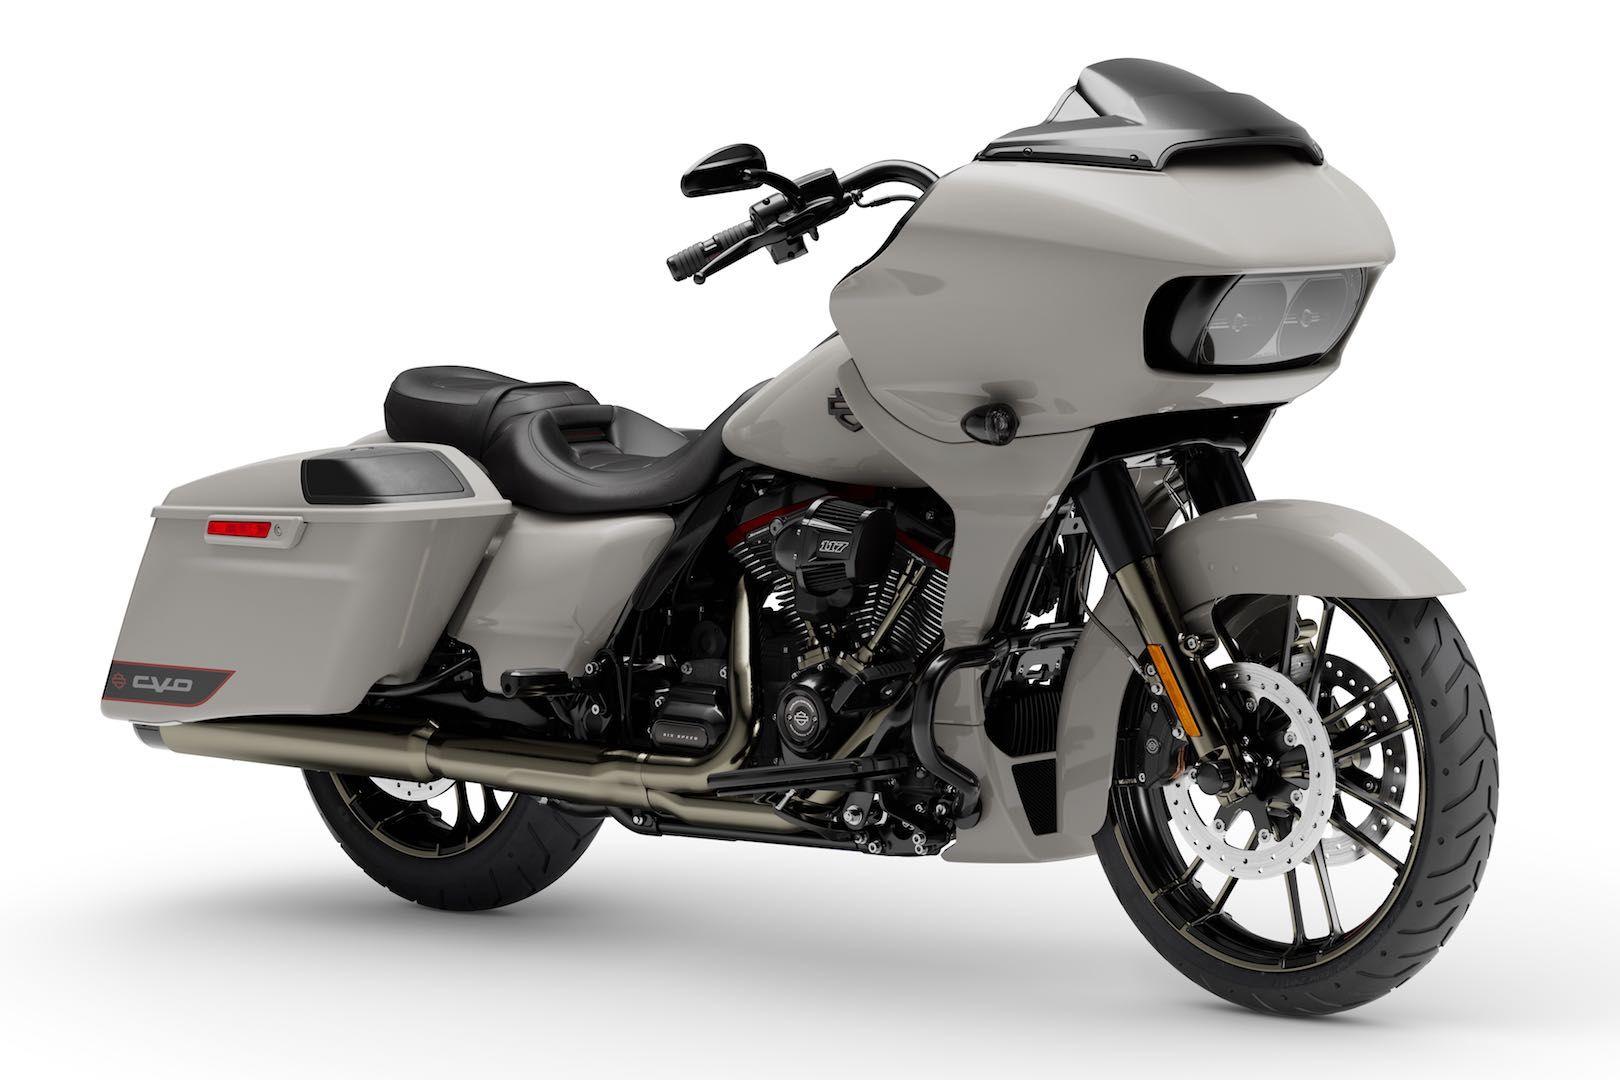 Pin On 2020 Harley Davidson Cvo Street Glide Price